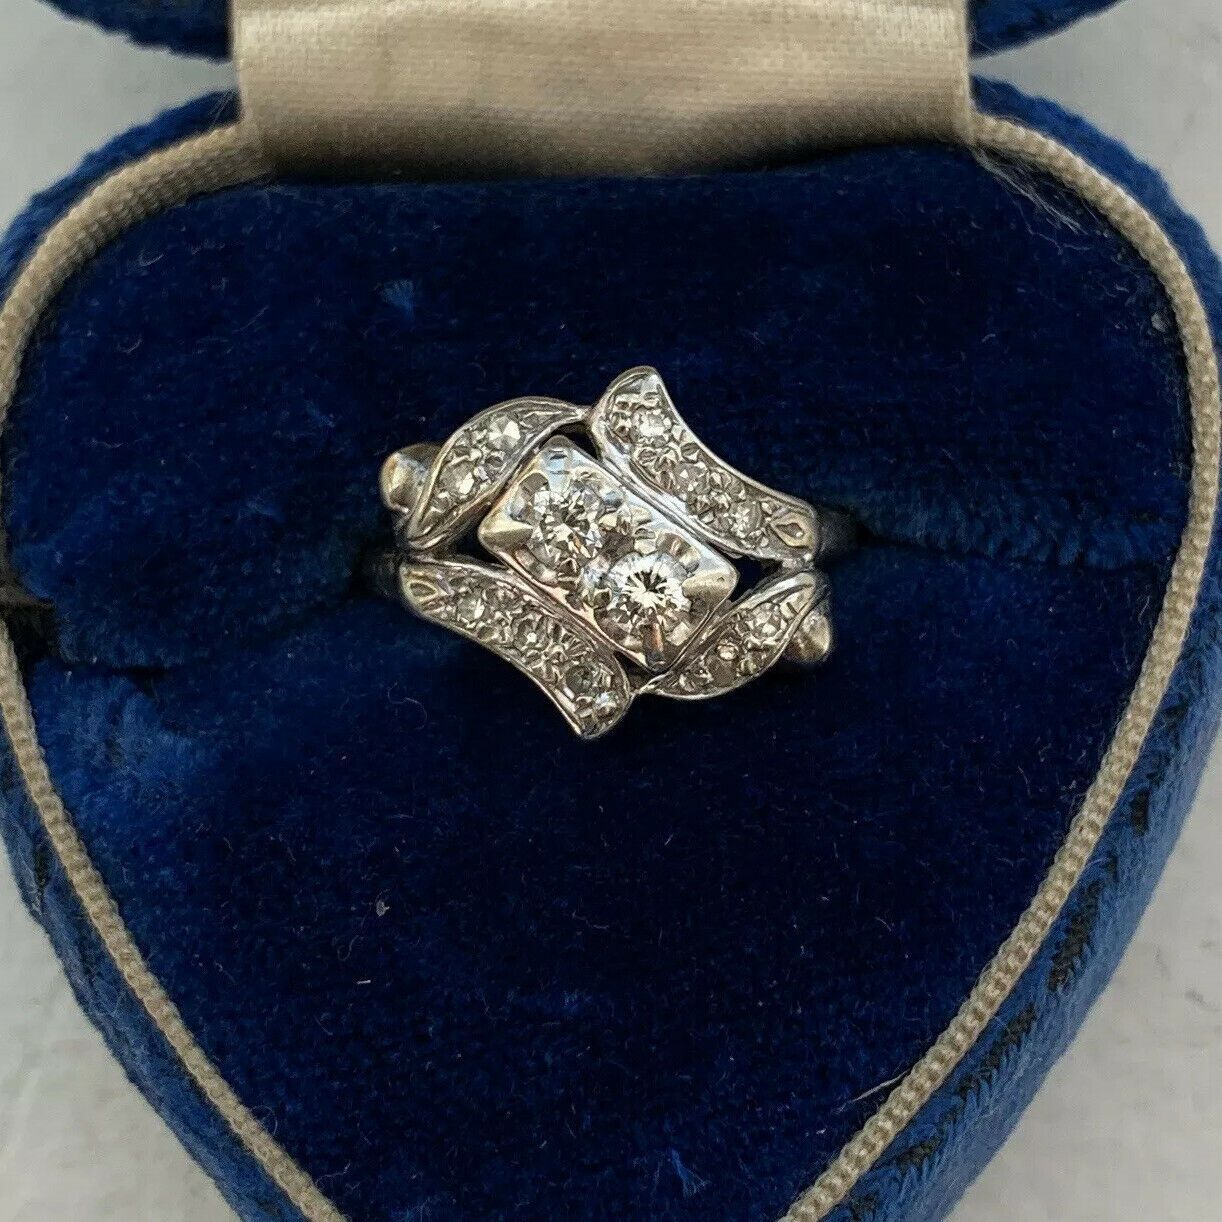 Vintage 14k White Gold Multiple Diamond Engagement Ring Stamped Coronation 6 25 Black Diamond Ring I In 2020 Engagement Rings Black Diamond Ring Diamond Engagement